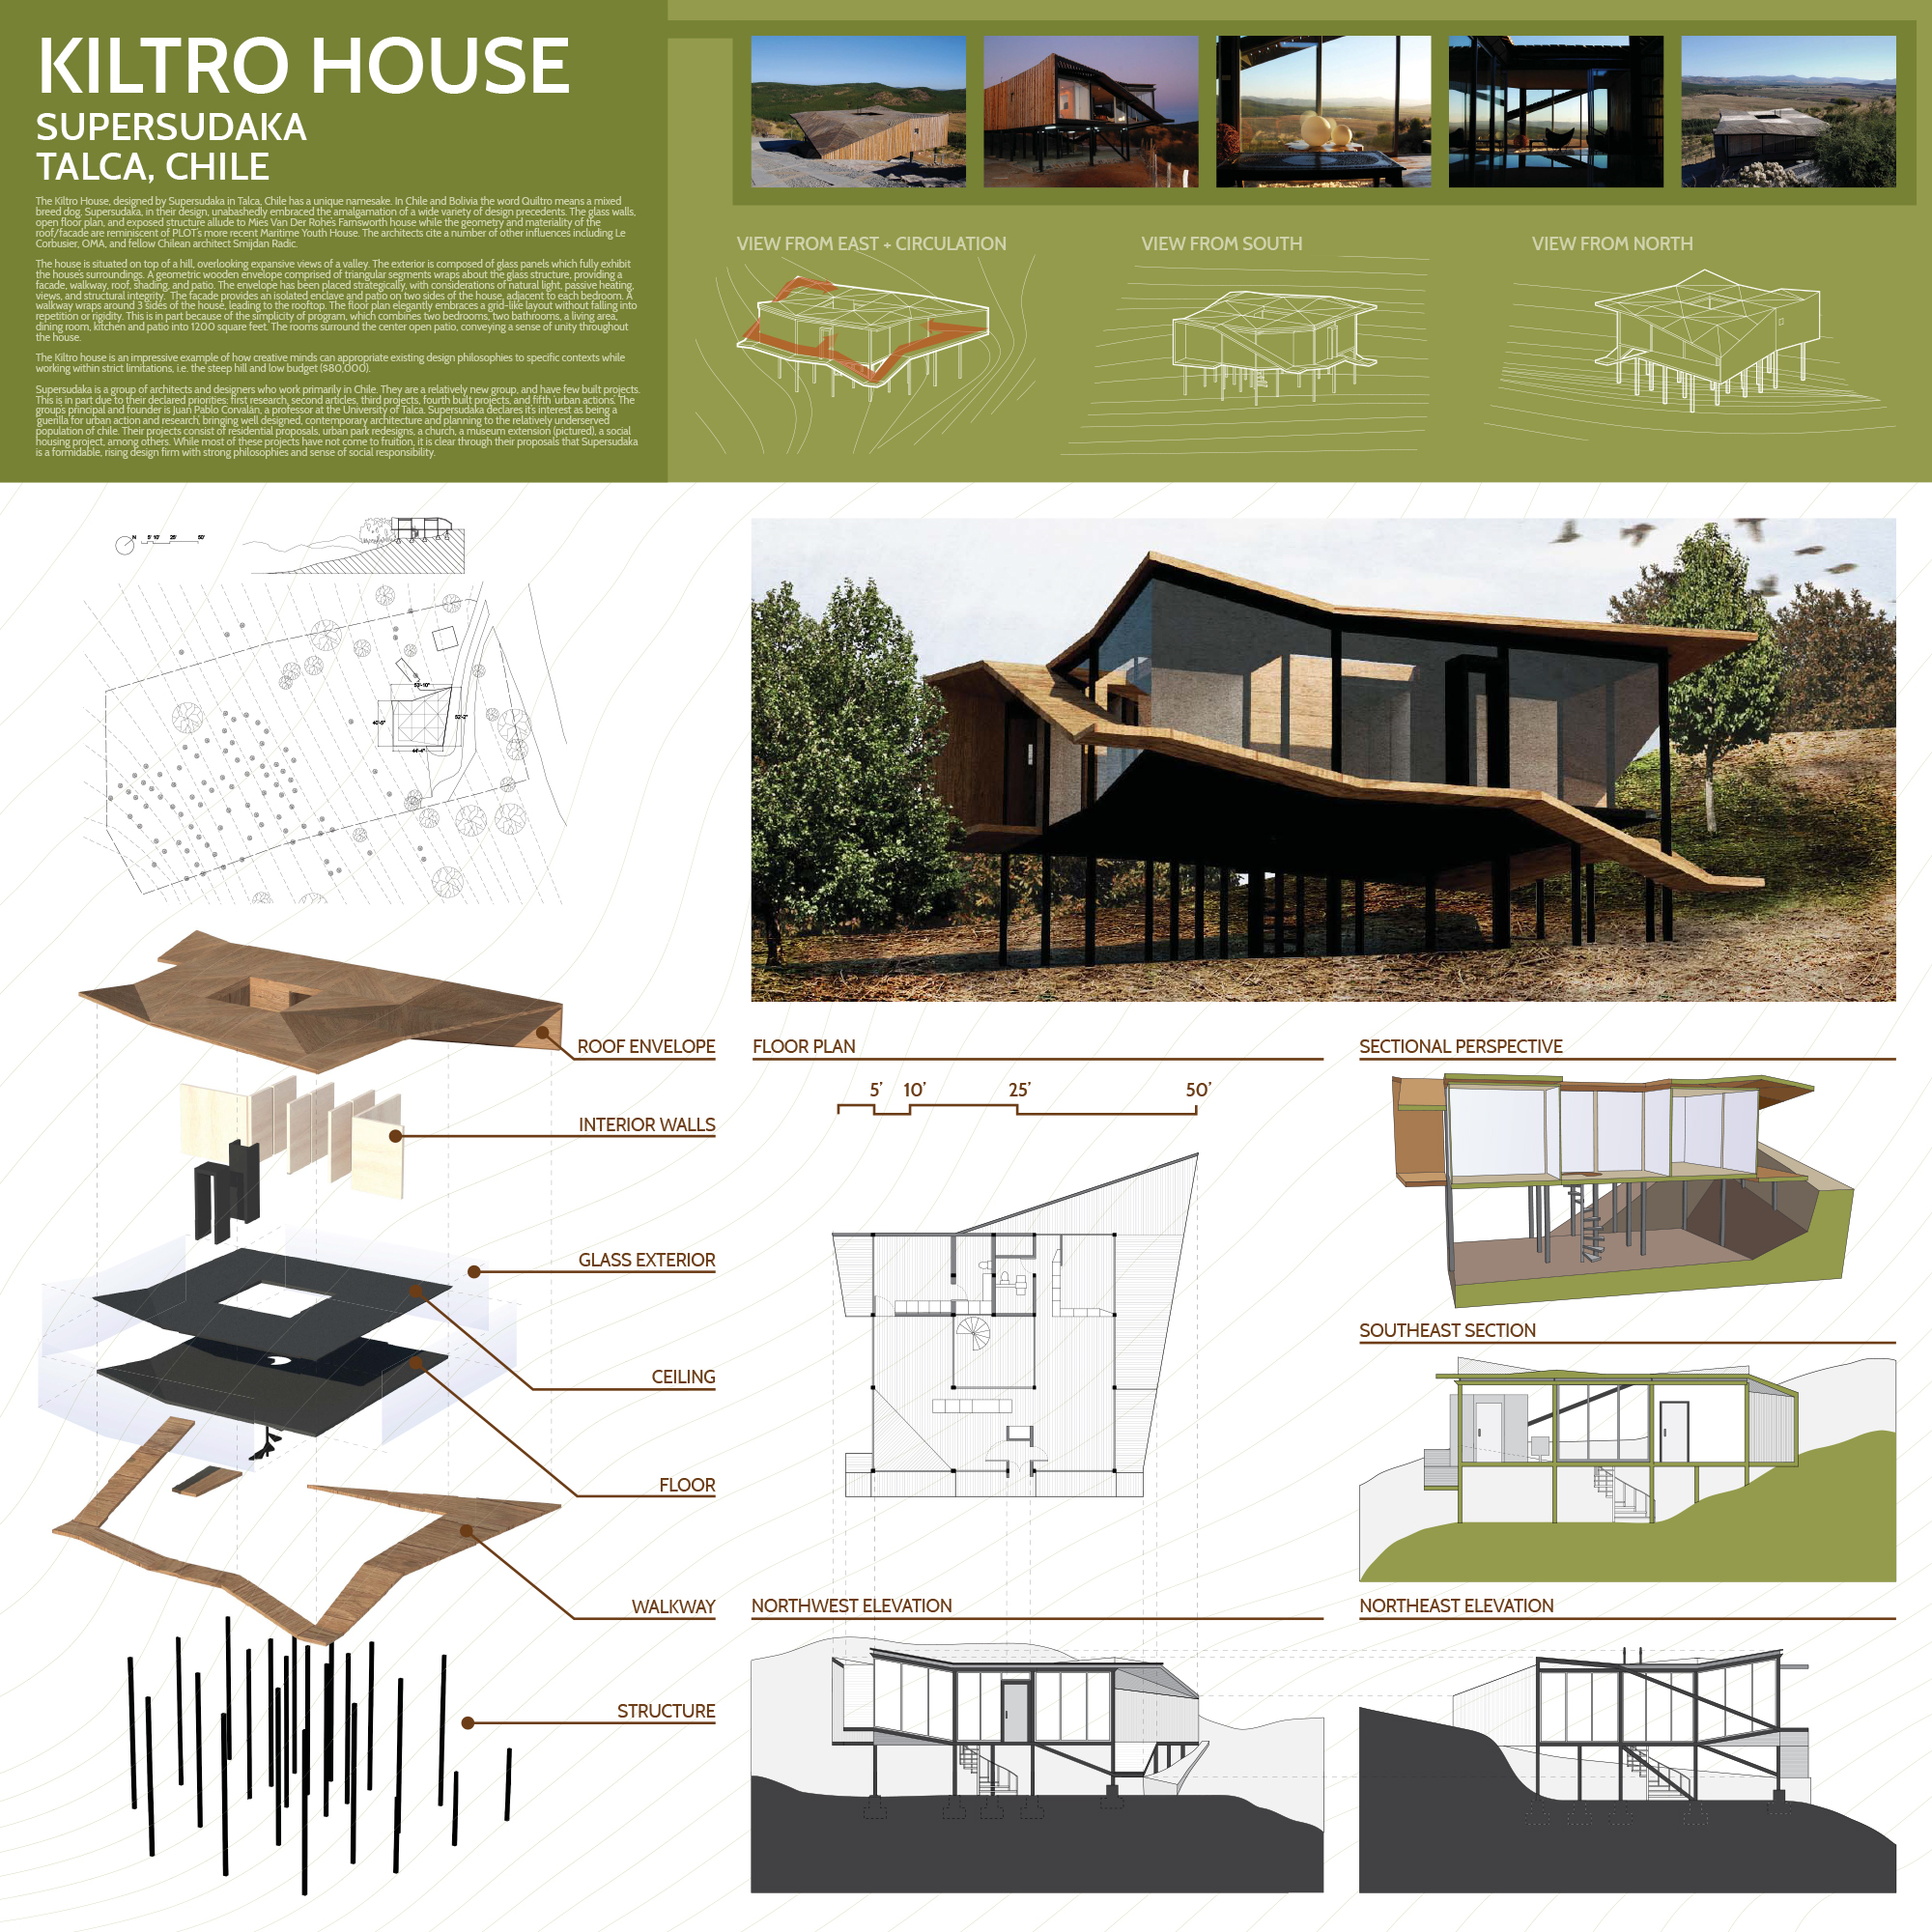 Kiltro House, Supersudaka, Ian Miley, Arch 124A, UC Berkeley